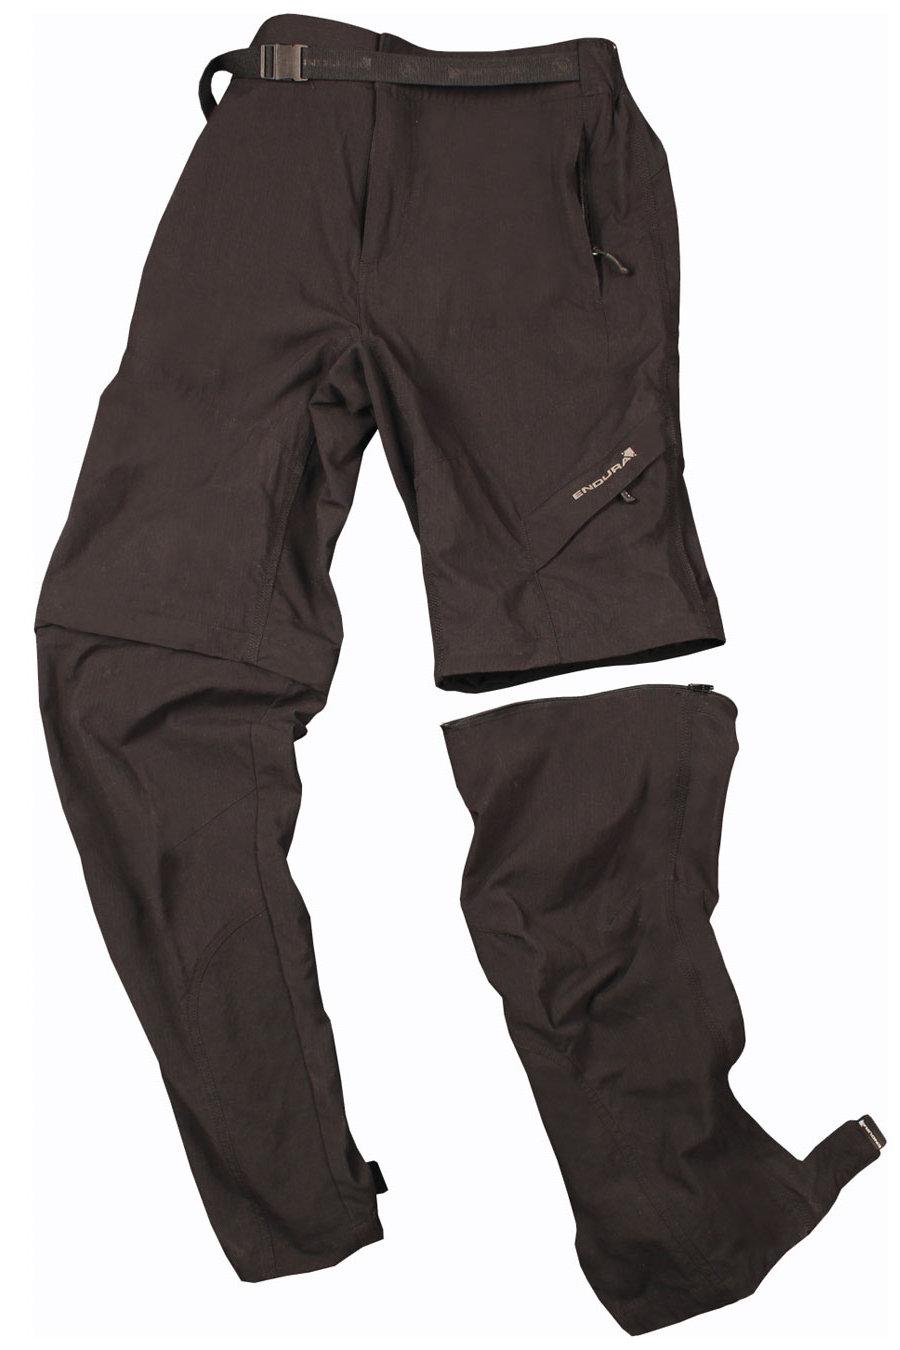 Hummvee zip_off_trousers_8